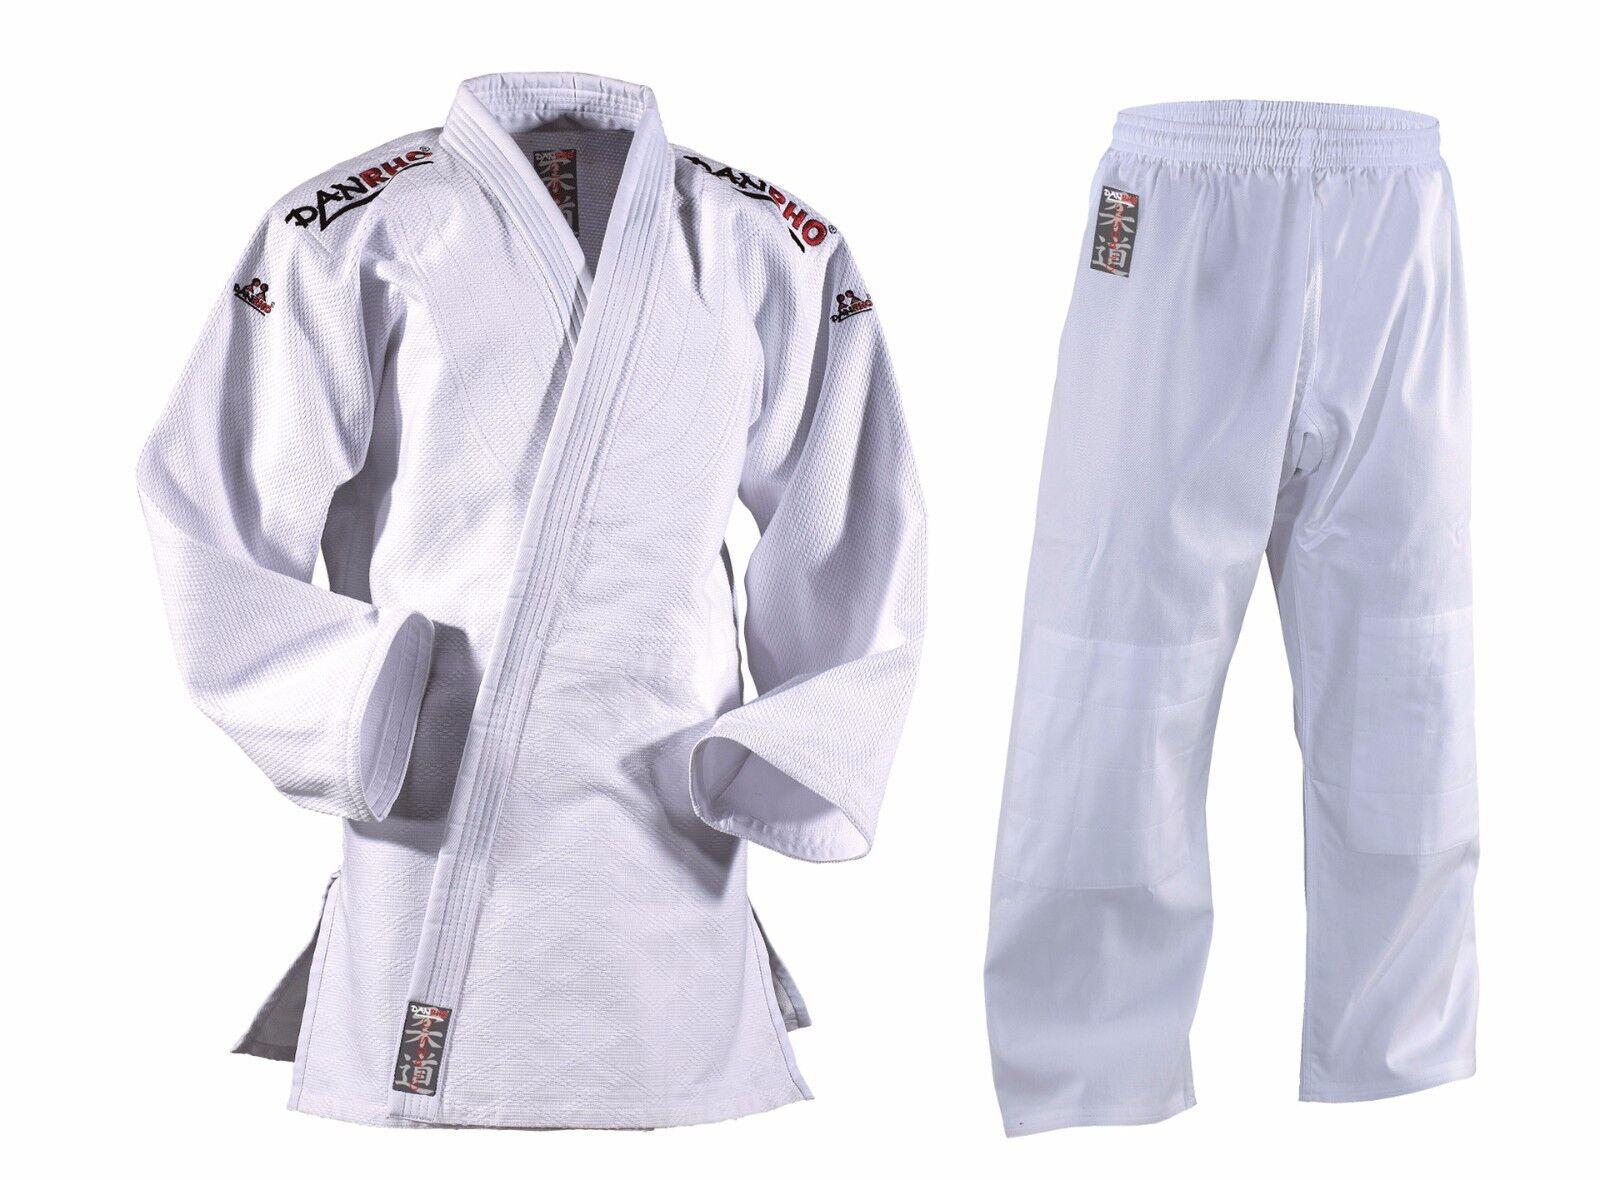 Judoanzug DanRho® Classic weiß 140-200, Ju Jutsu, Aikido, Aikido, Aikido, Karate, 550g m² Kwon® 61c832